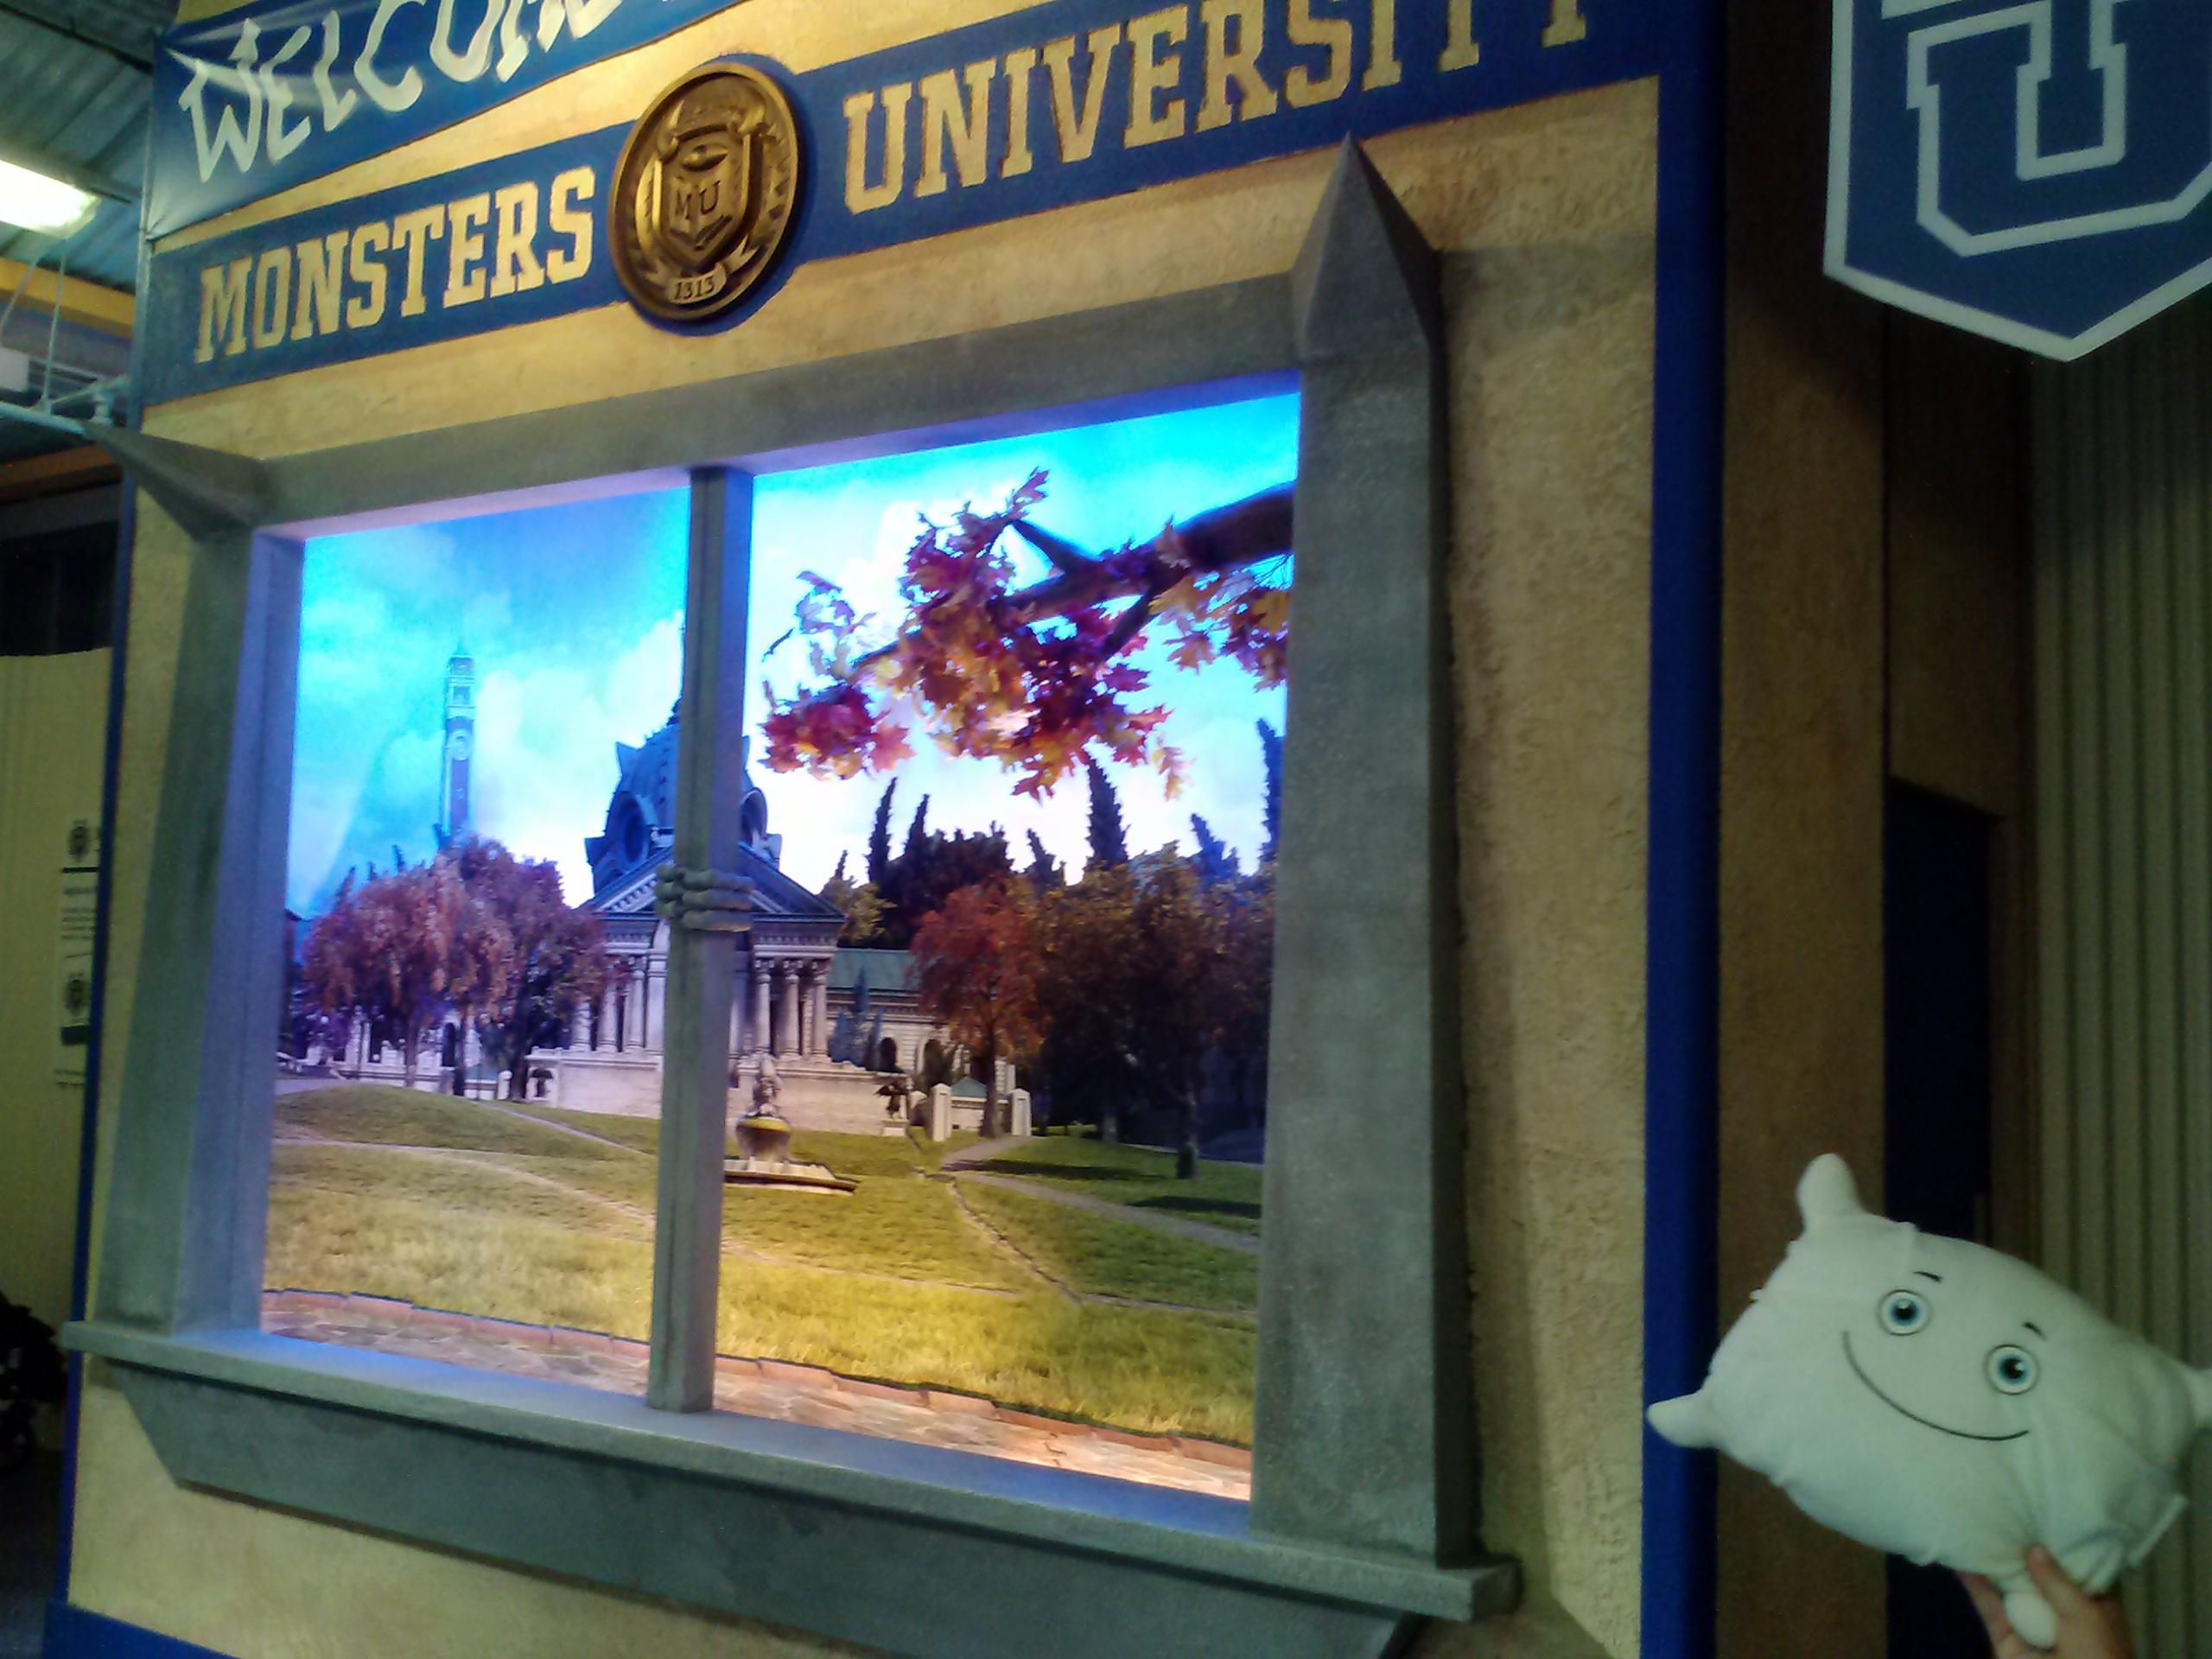 McStuffy is enrolling in Monsters University